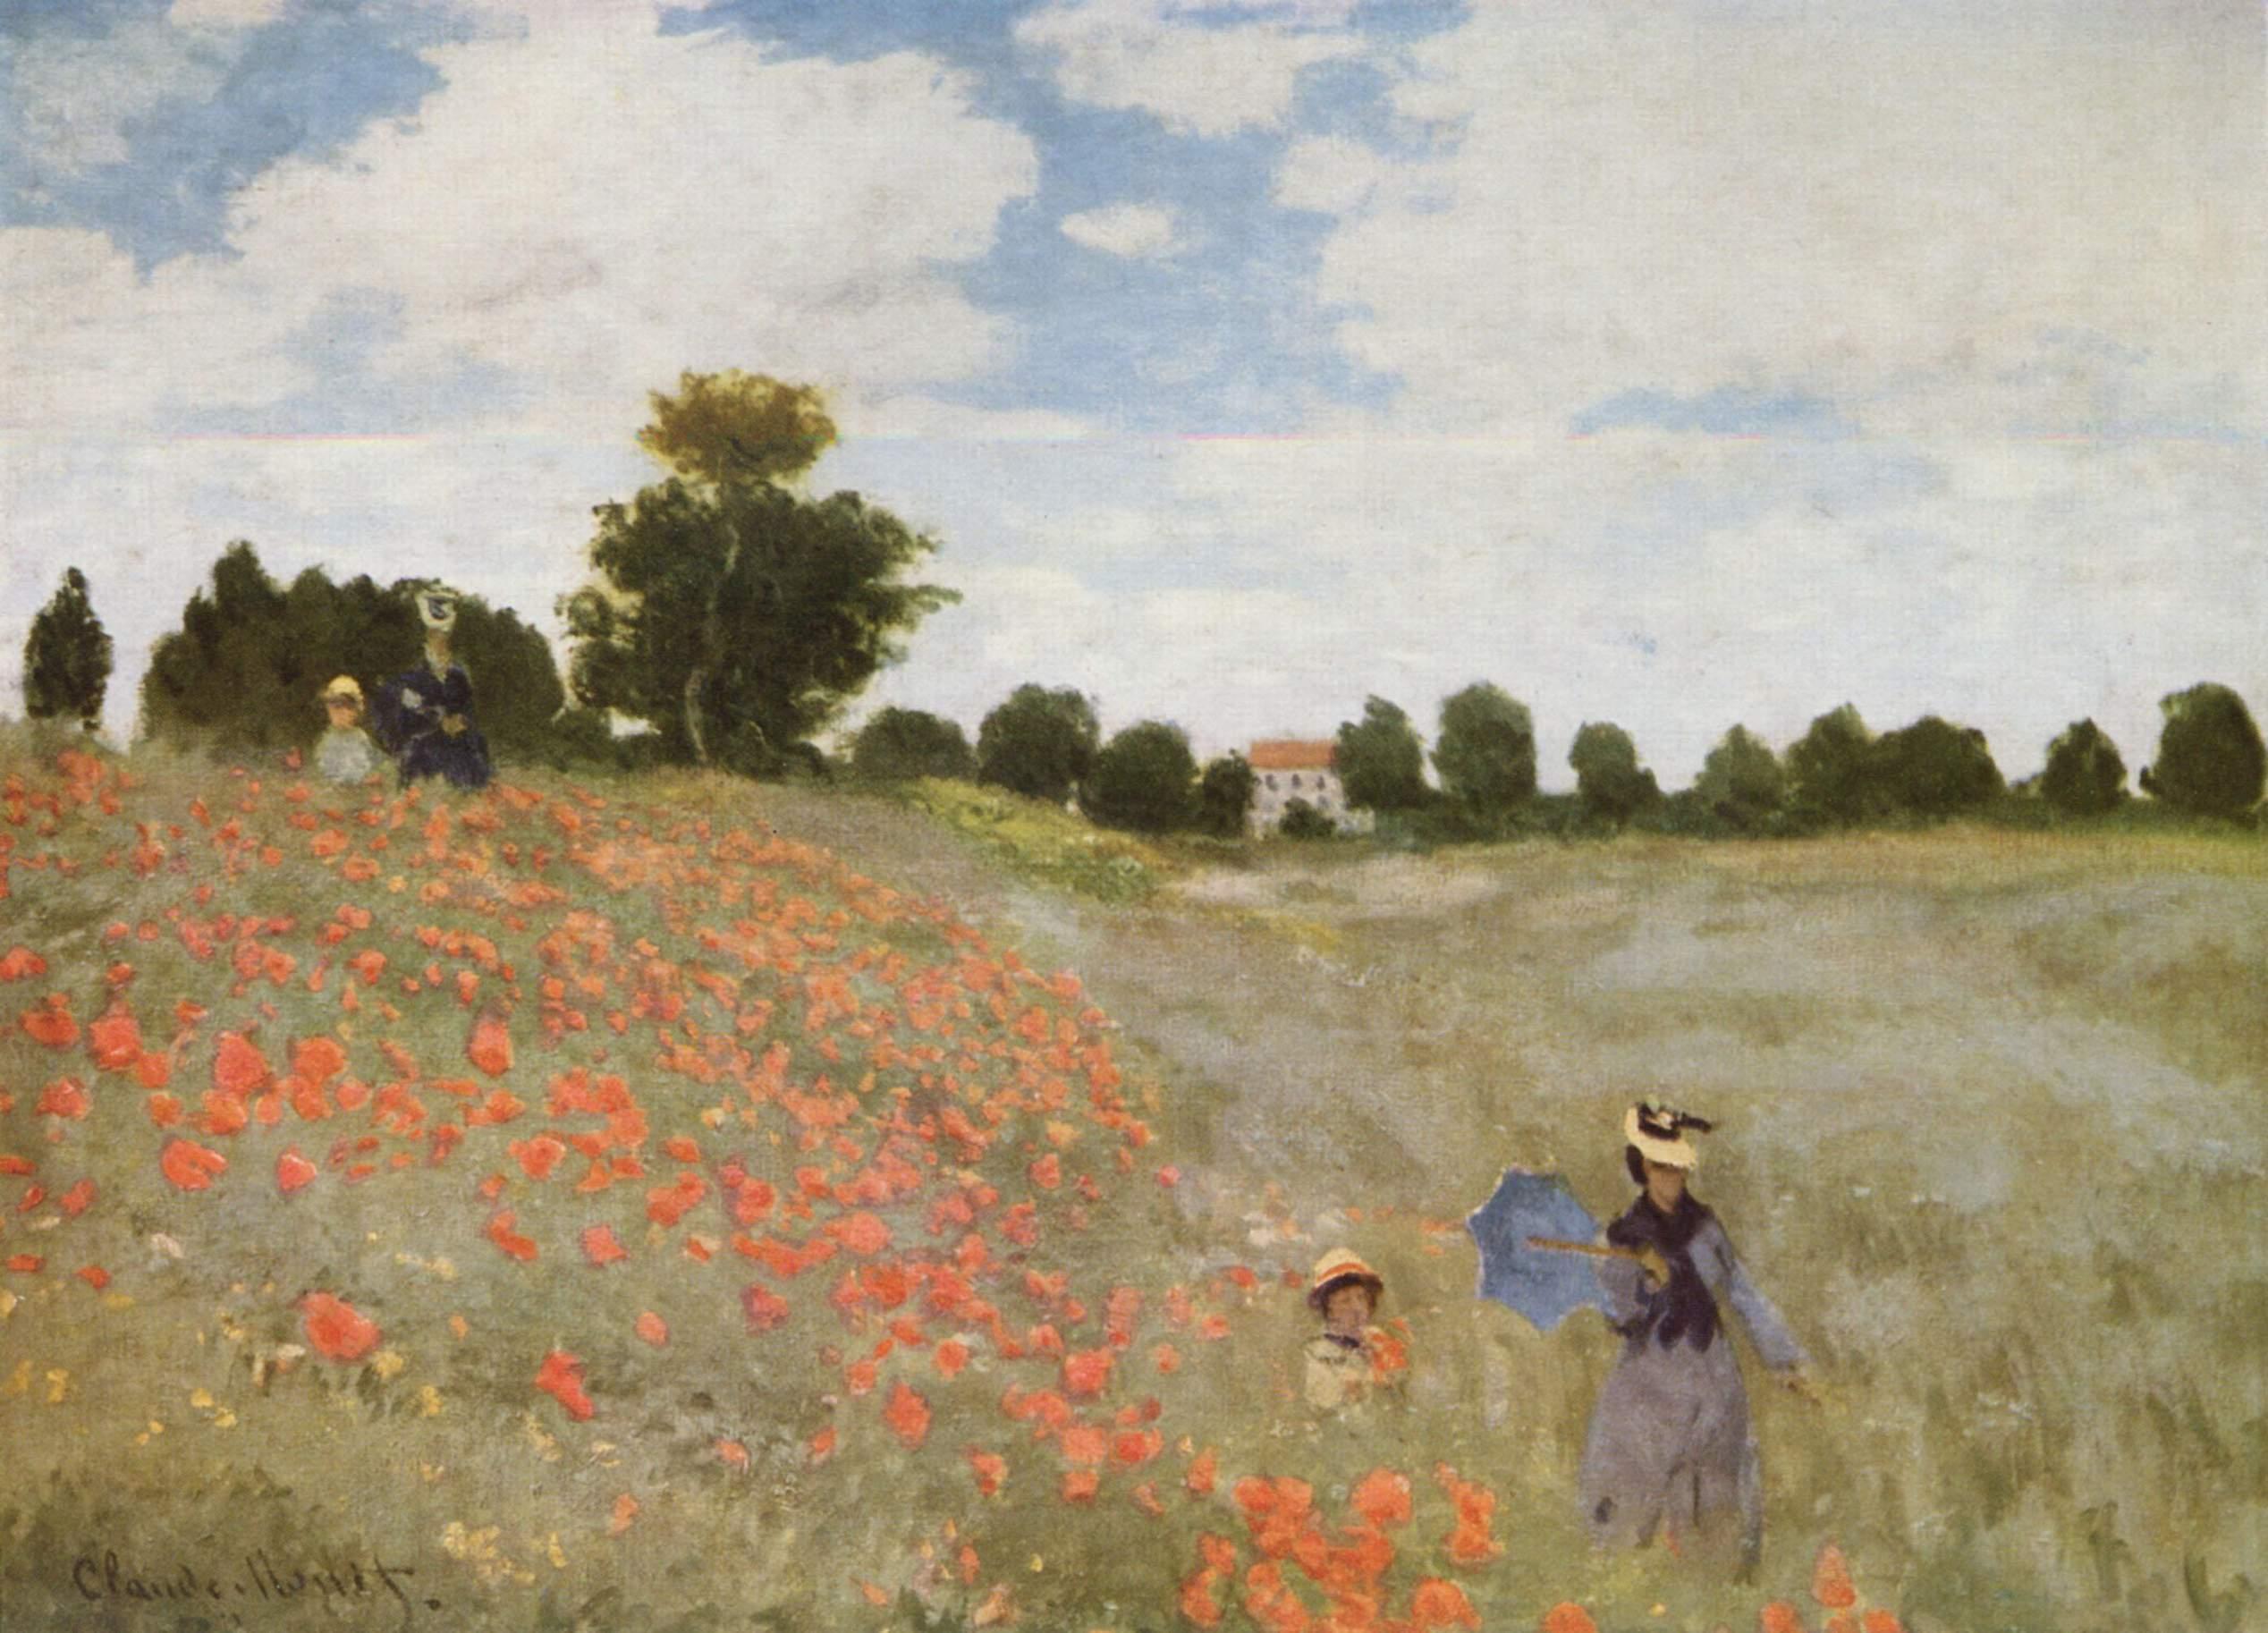 Claude Monet, I Papaveri, 1873 - wikipedia